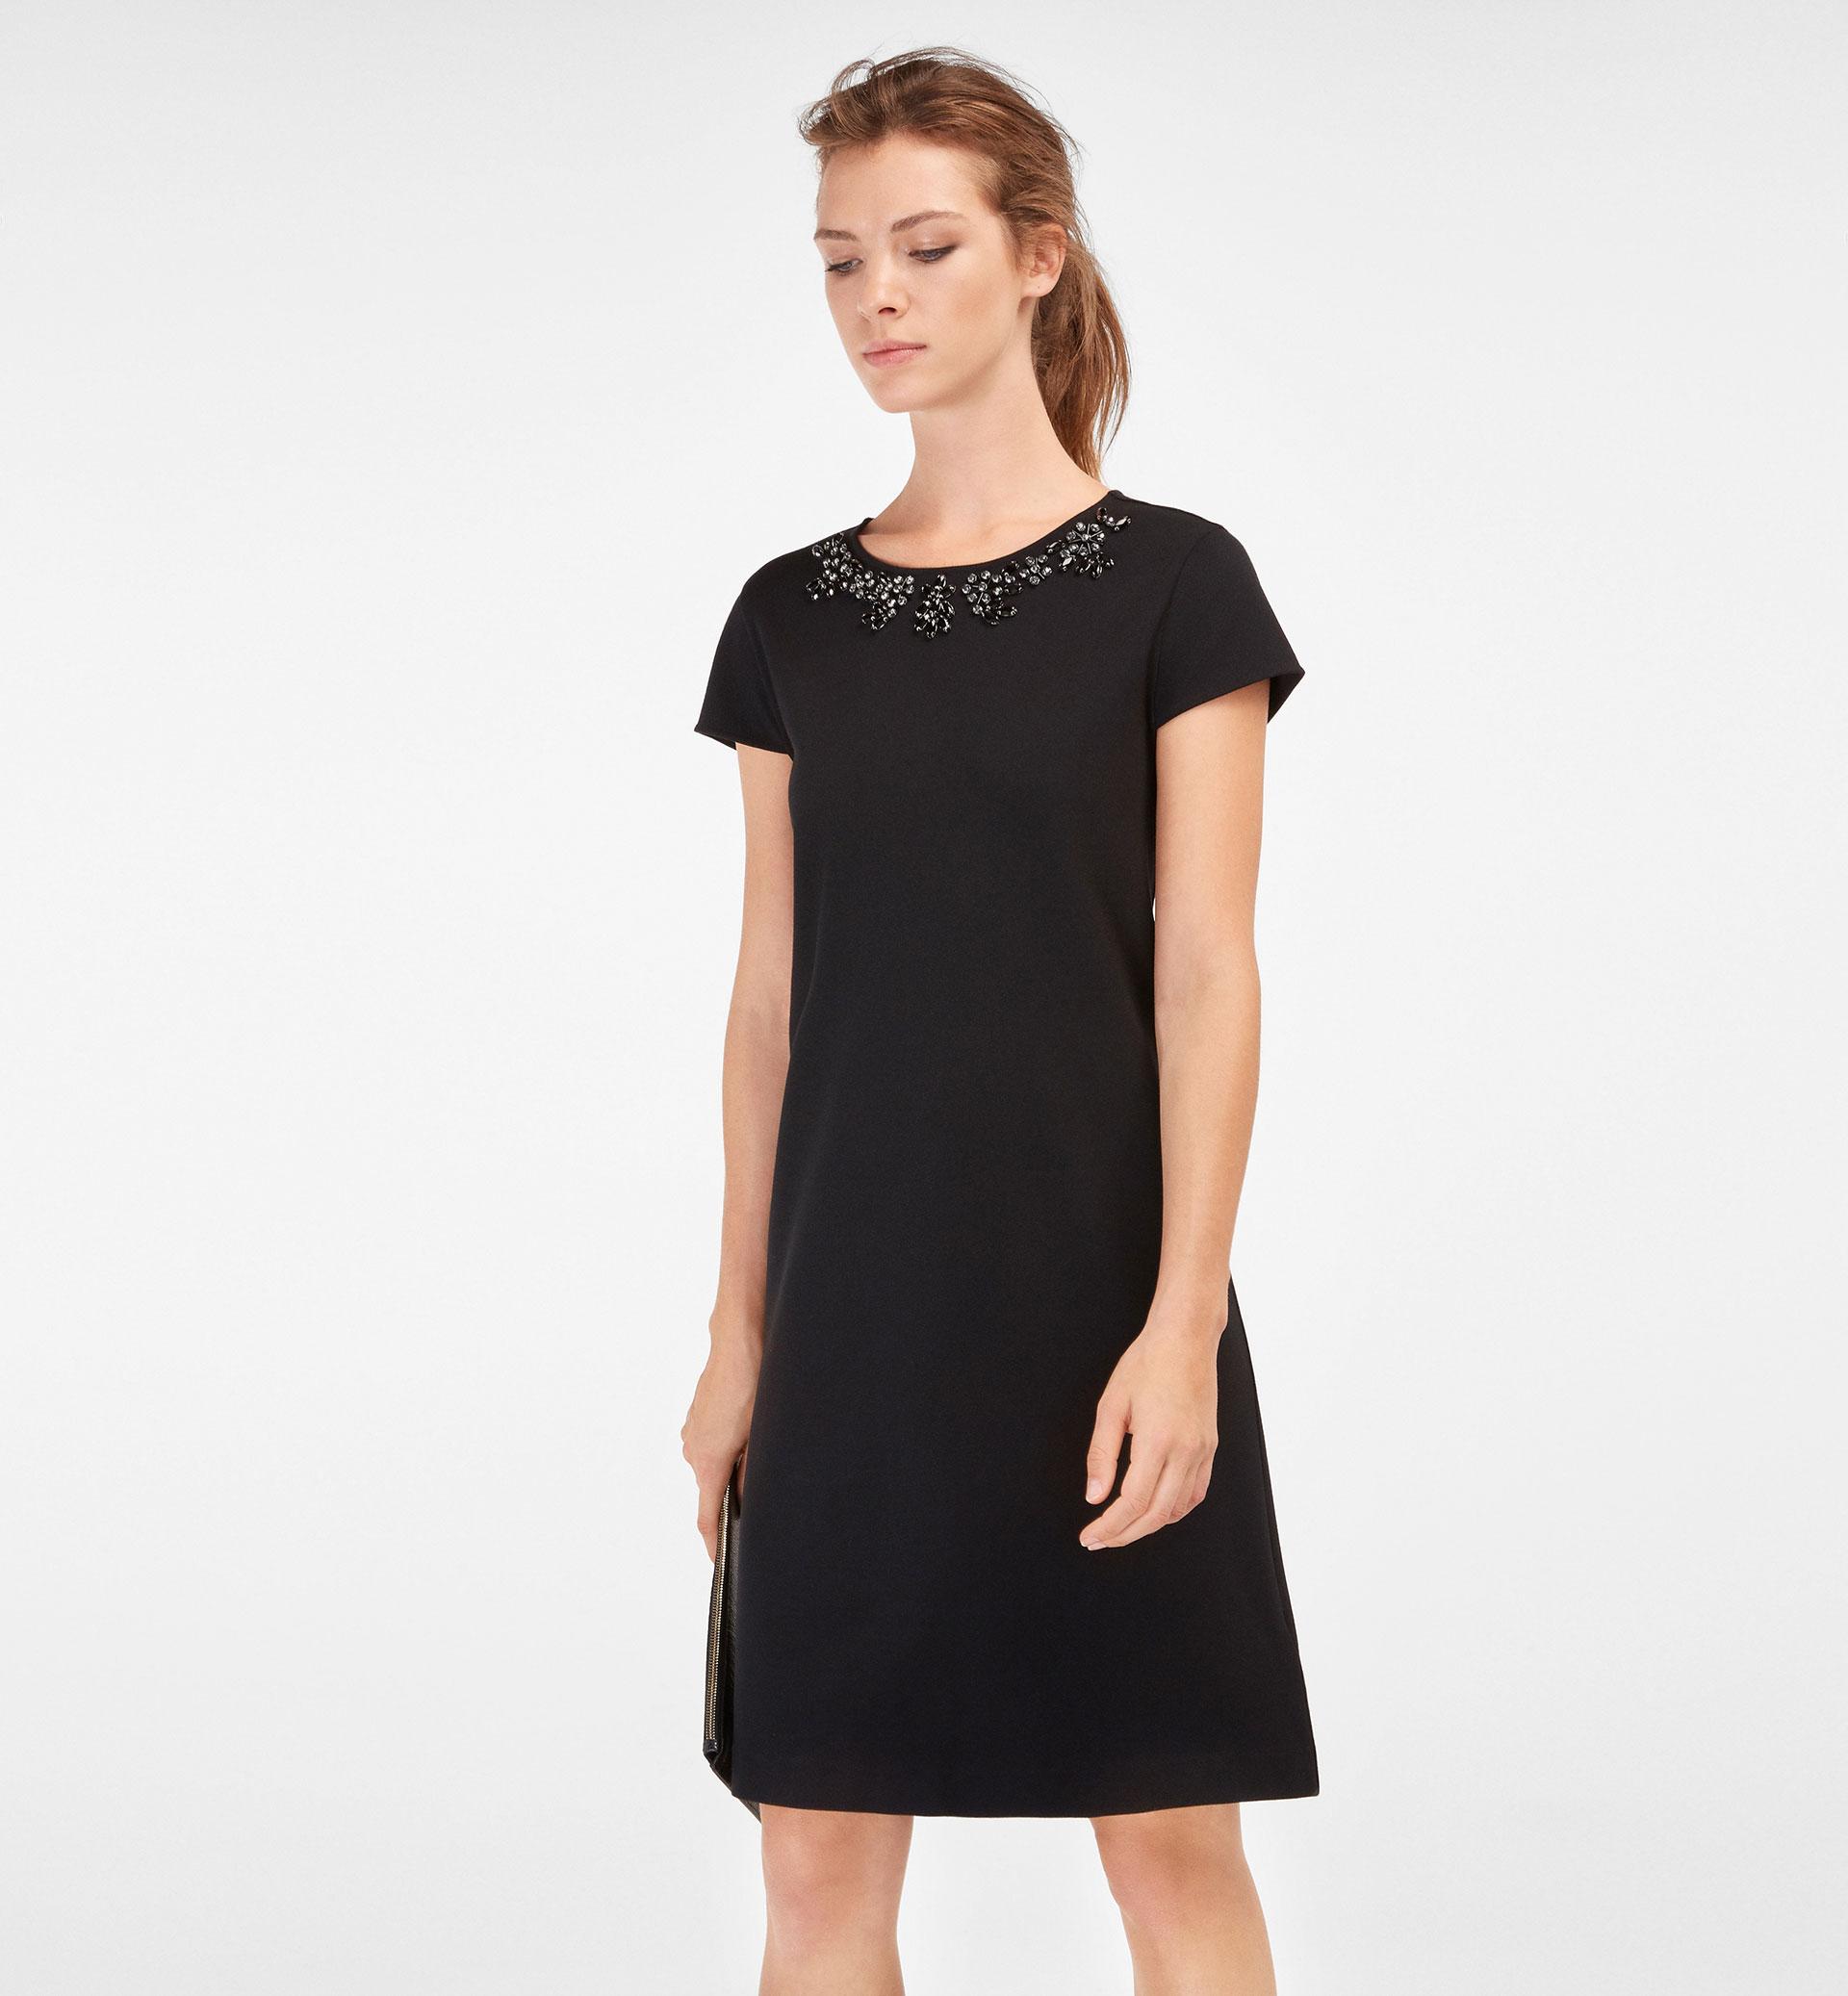 BLACK DRESS, JEWELLED NECKLINE